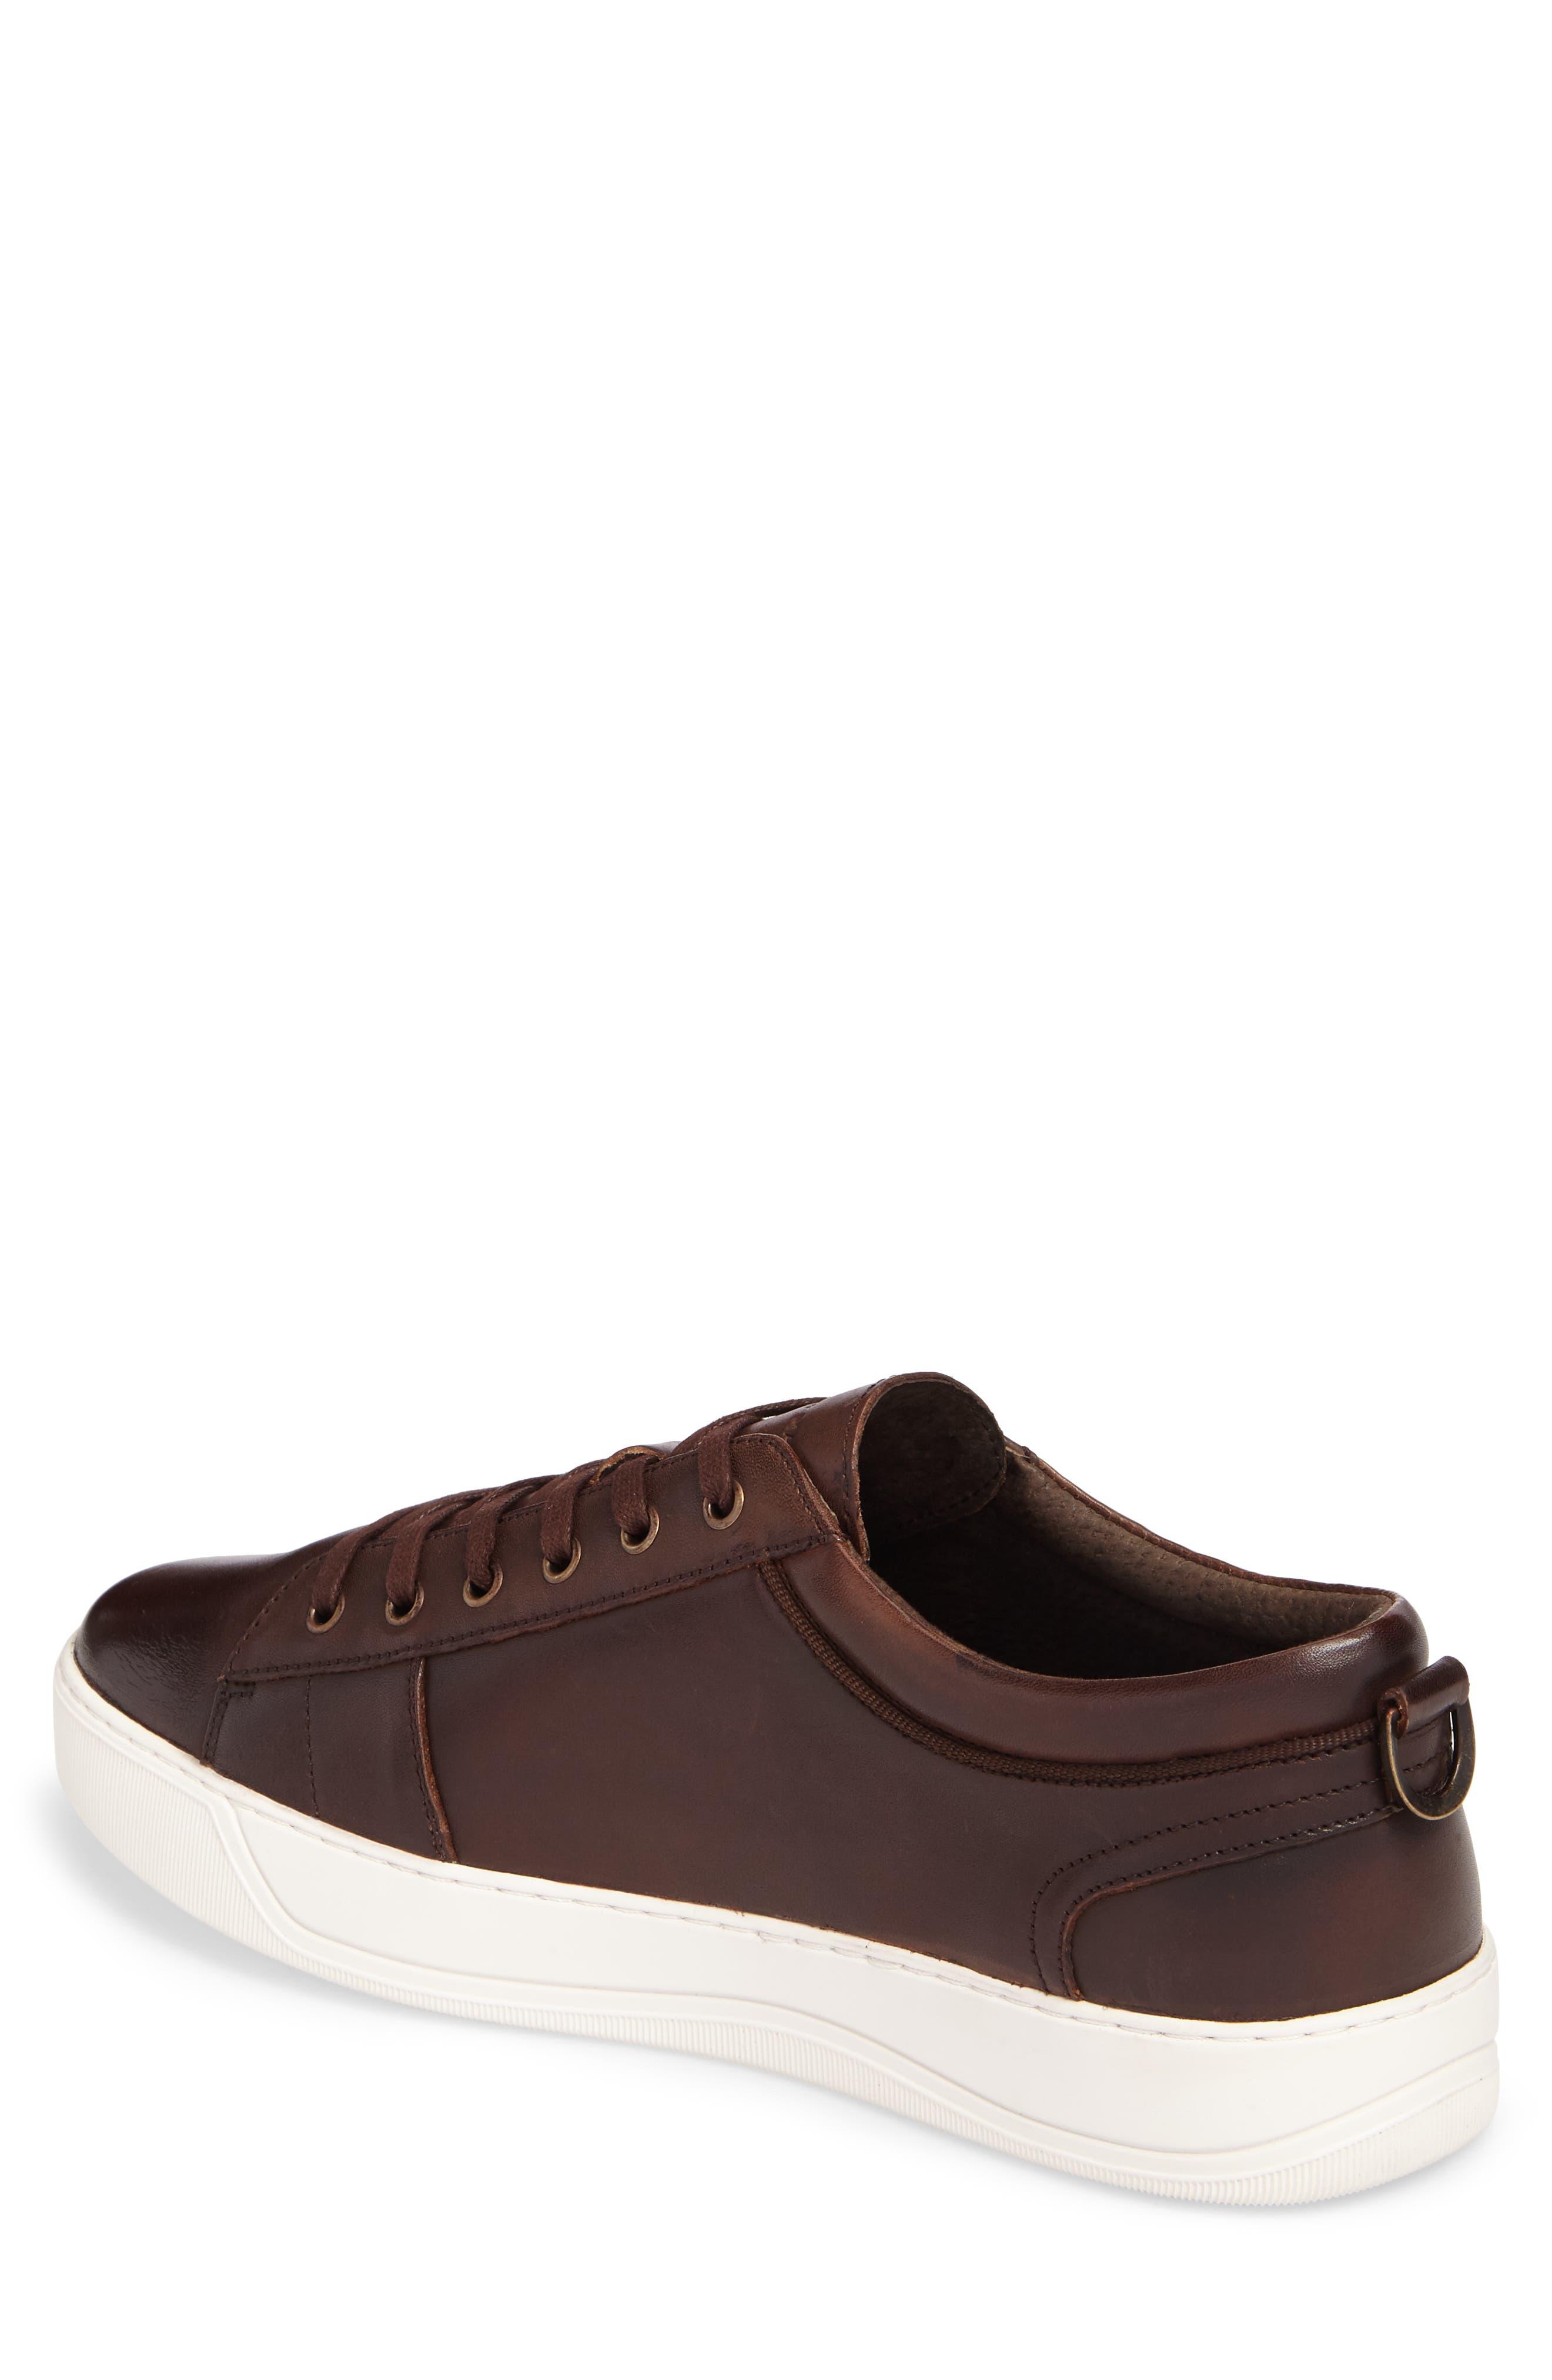 'Darwood' Sneaker,                             Alternate thumbnail 2, color,                             Dark Brown/ White Leather